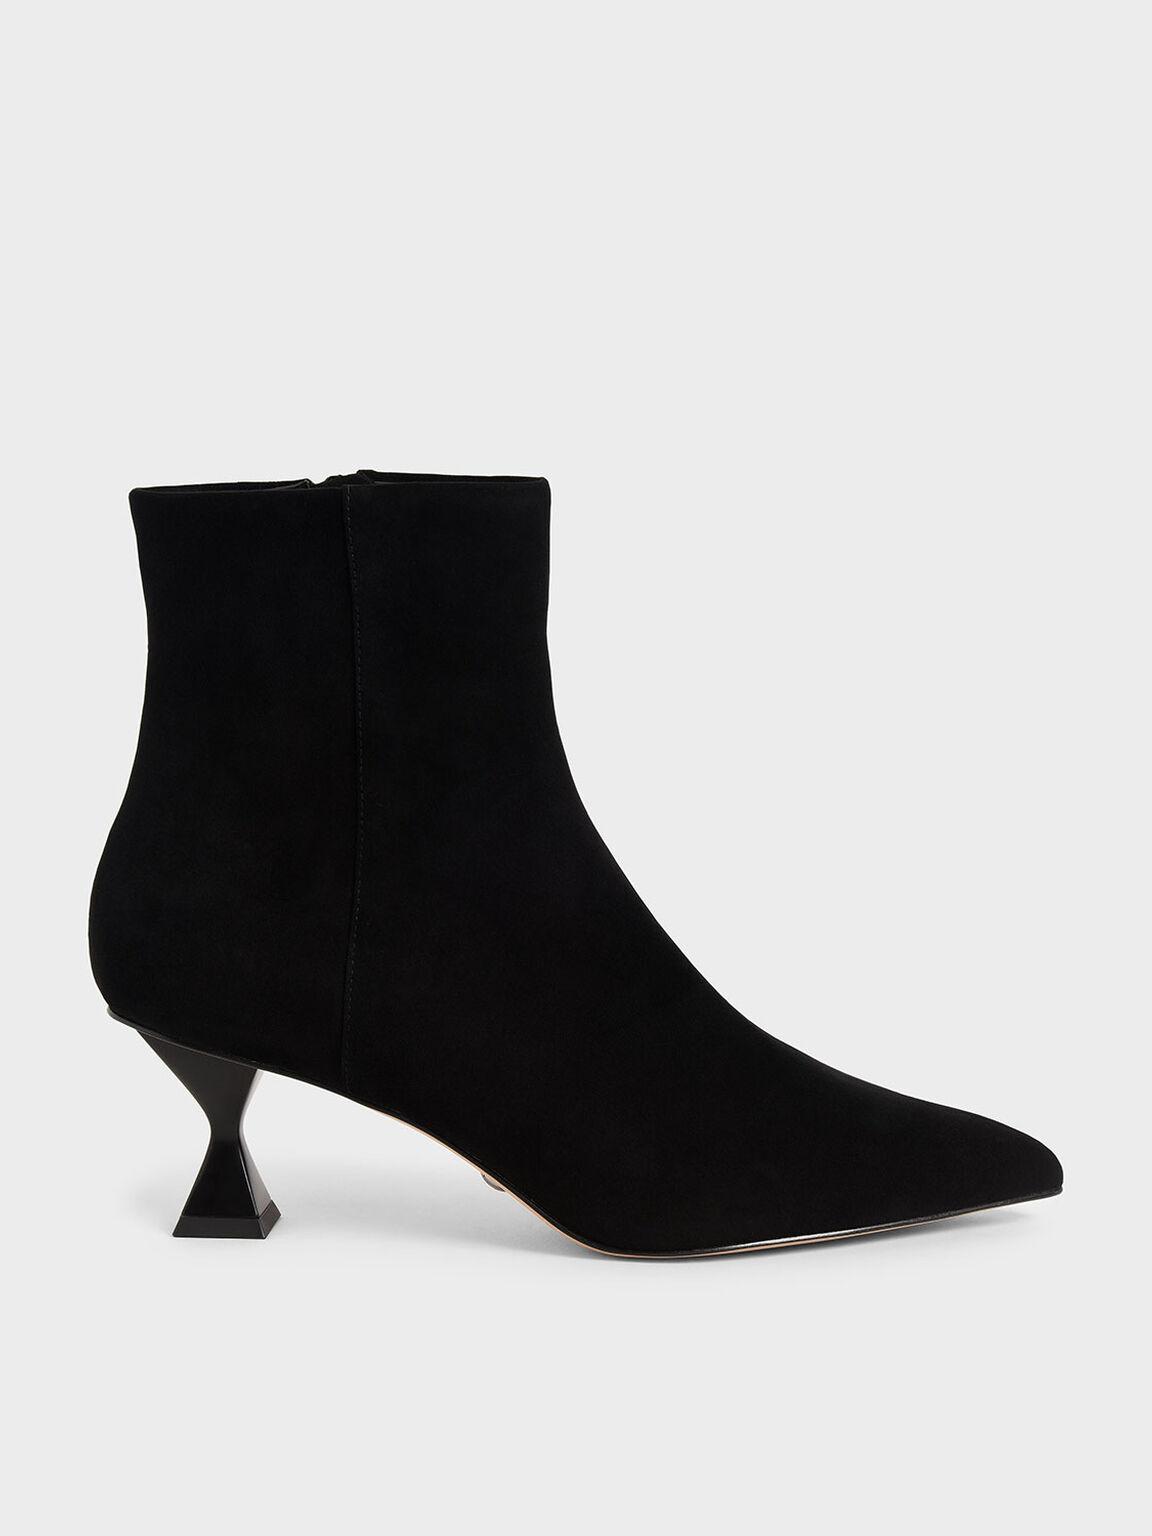 Sculptural Heel Ankle Boots (Kid Suede), Black, hi-res